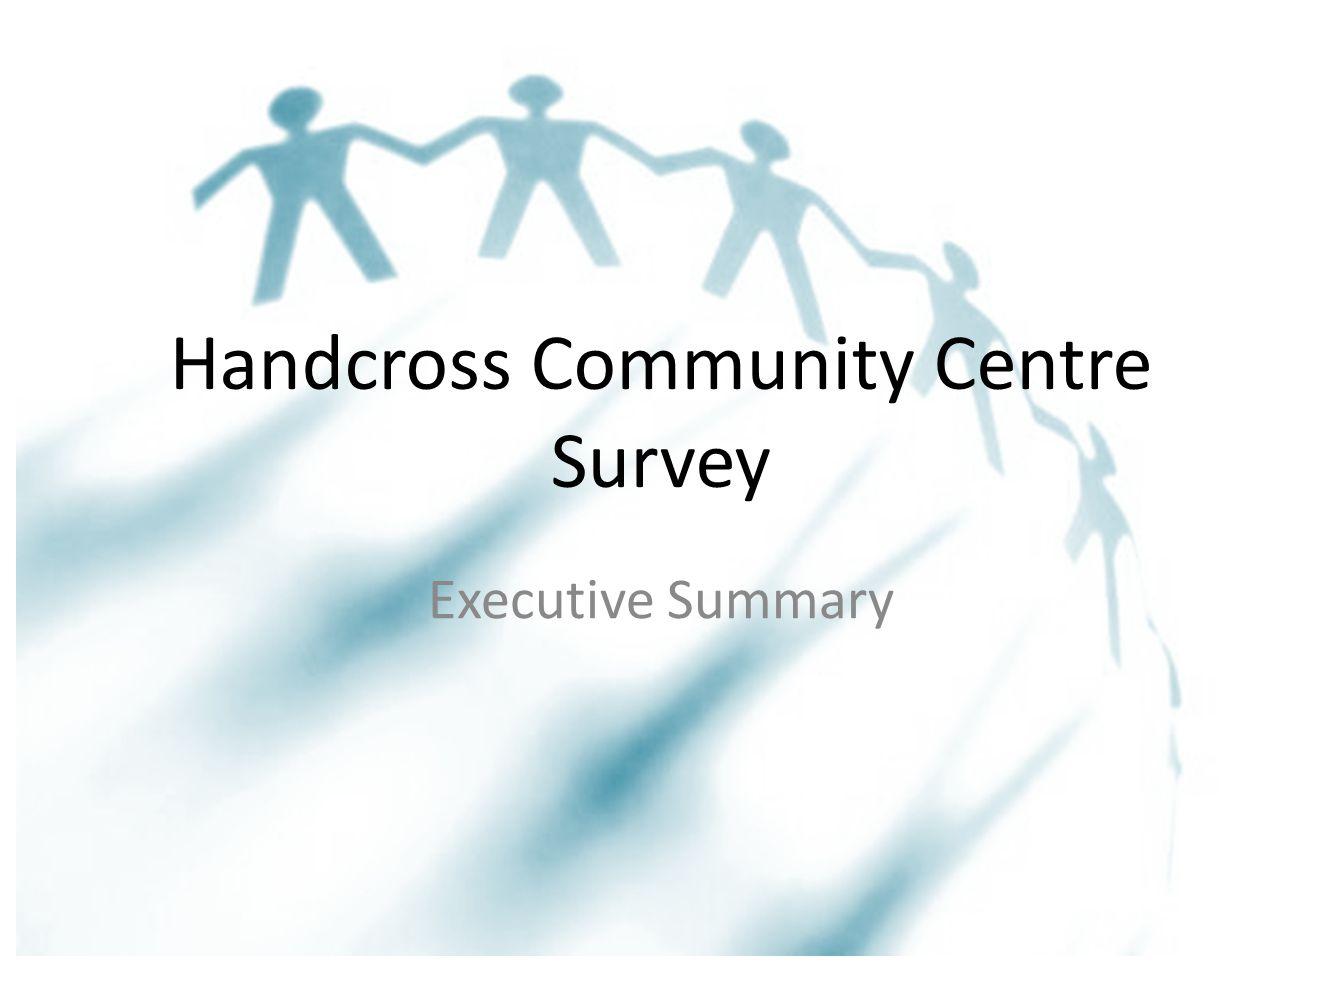 Handcross Community Centre Survey Executive Summary